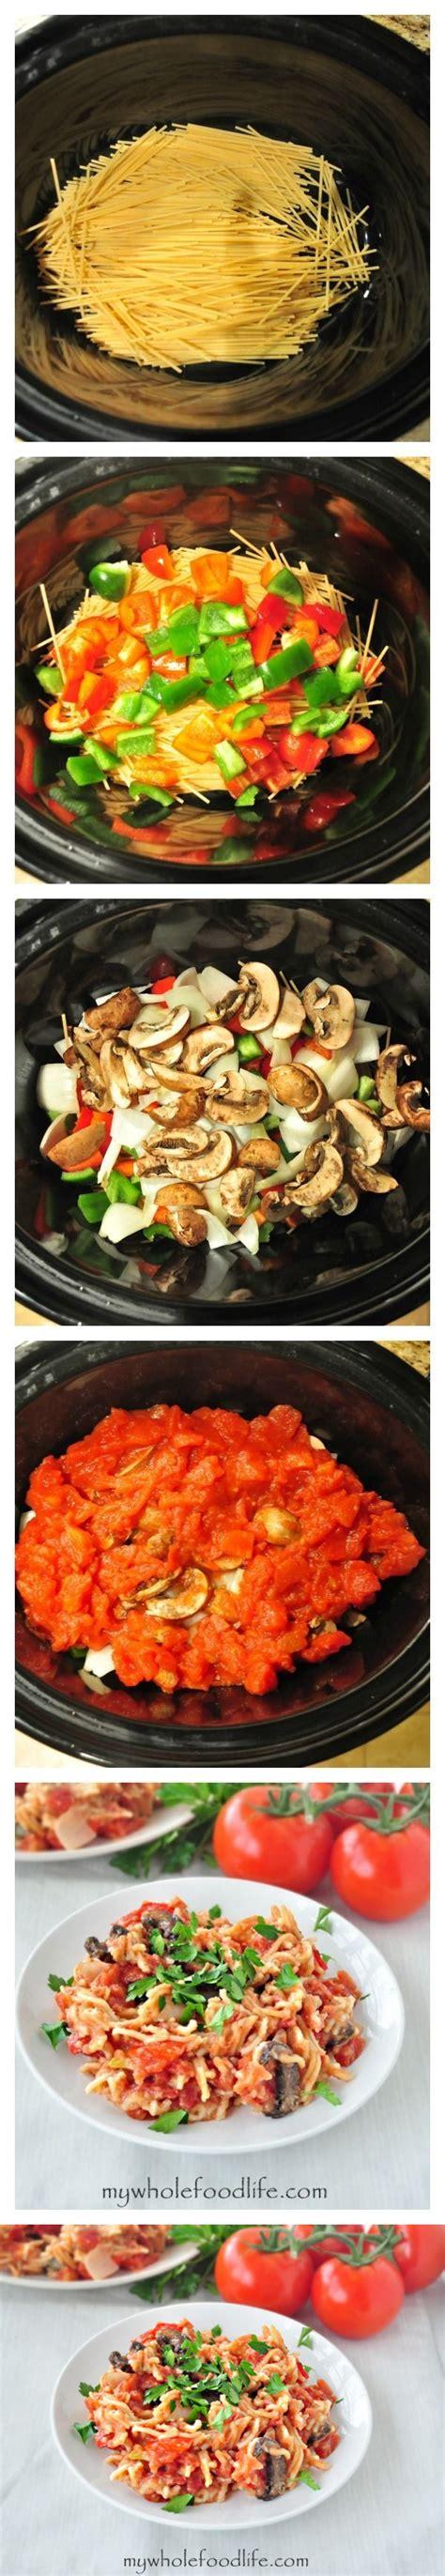 vegetables in crock pot crock pot spaghetti vegetables